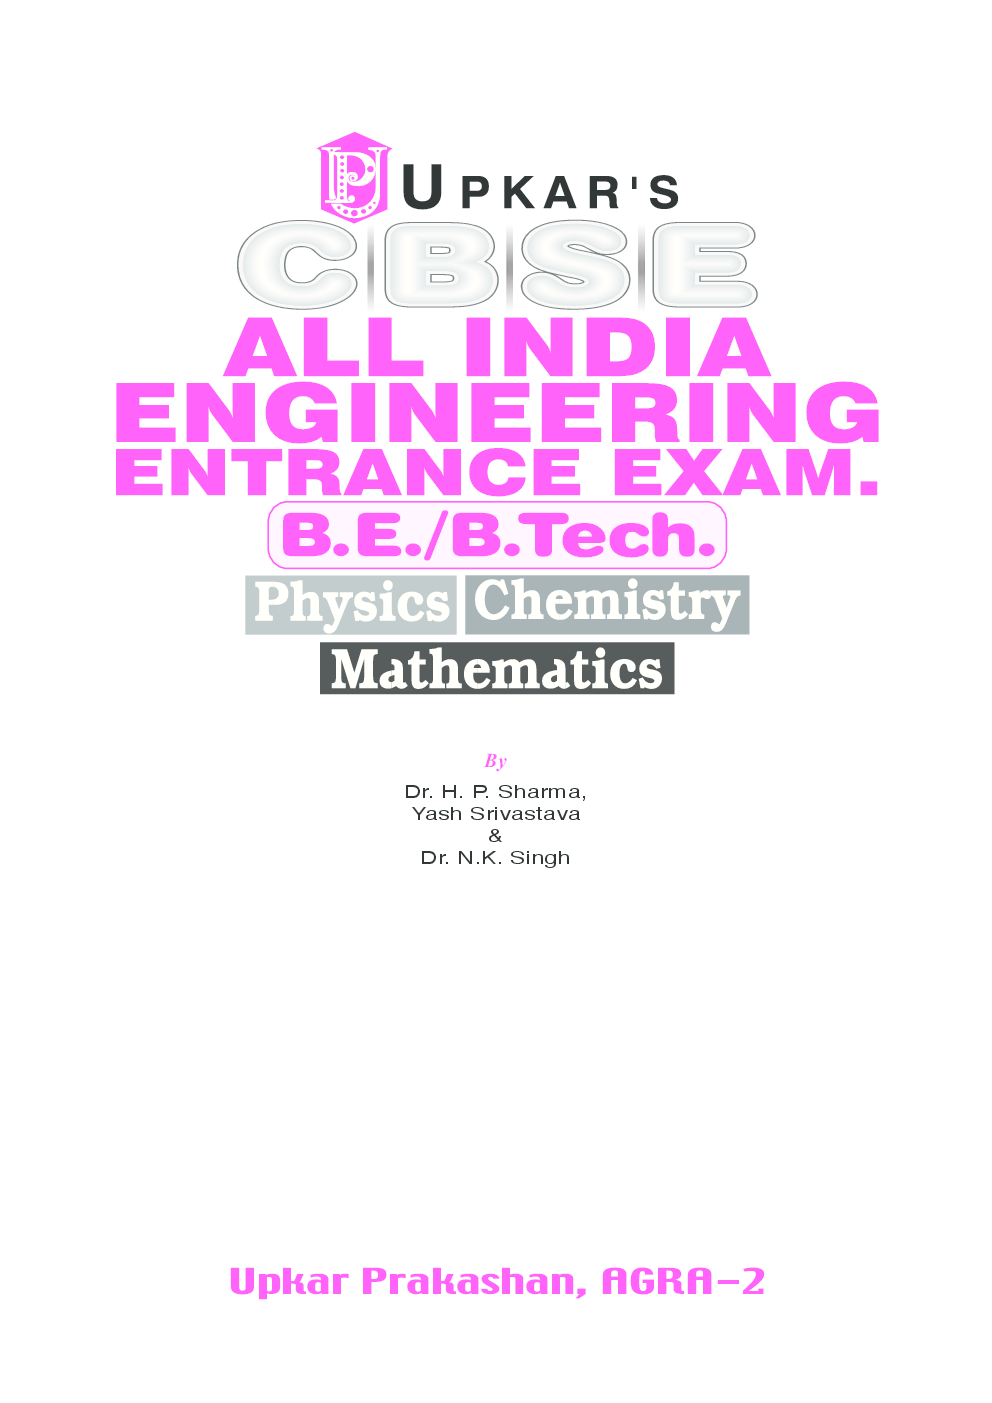 CBSE All India Engineering Entrance Exam. B.E./B.Tech. - Page 2